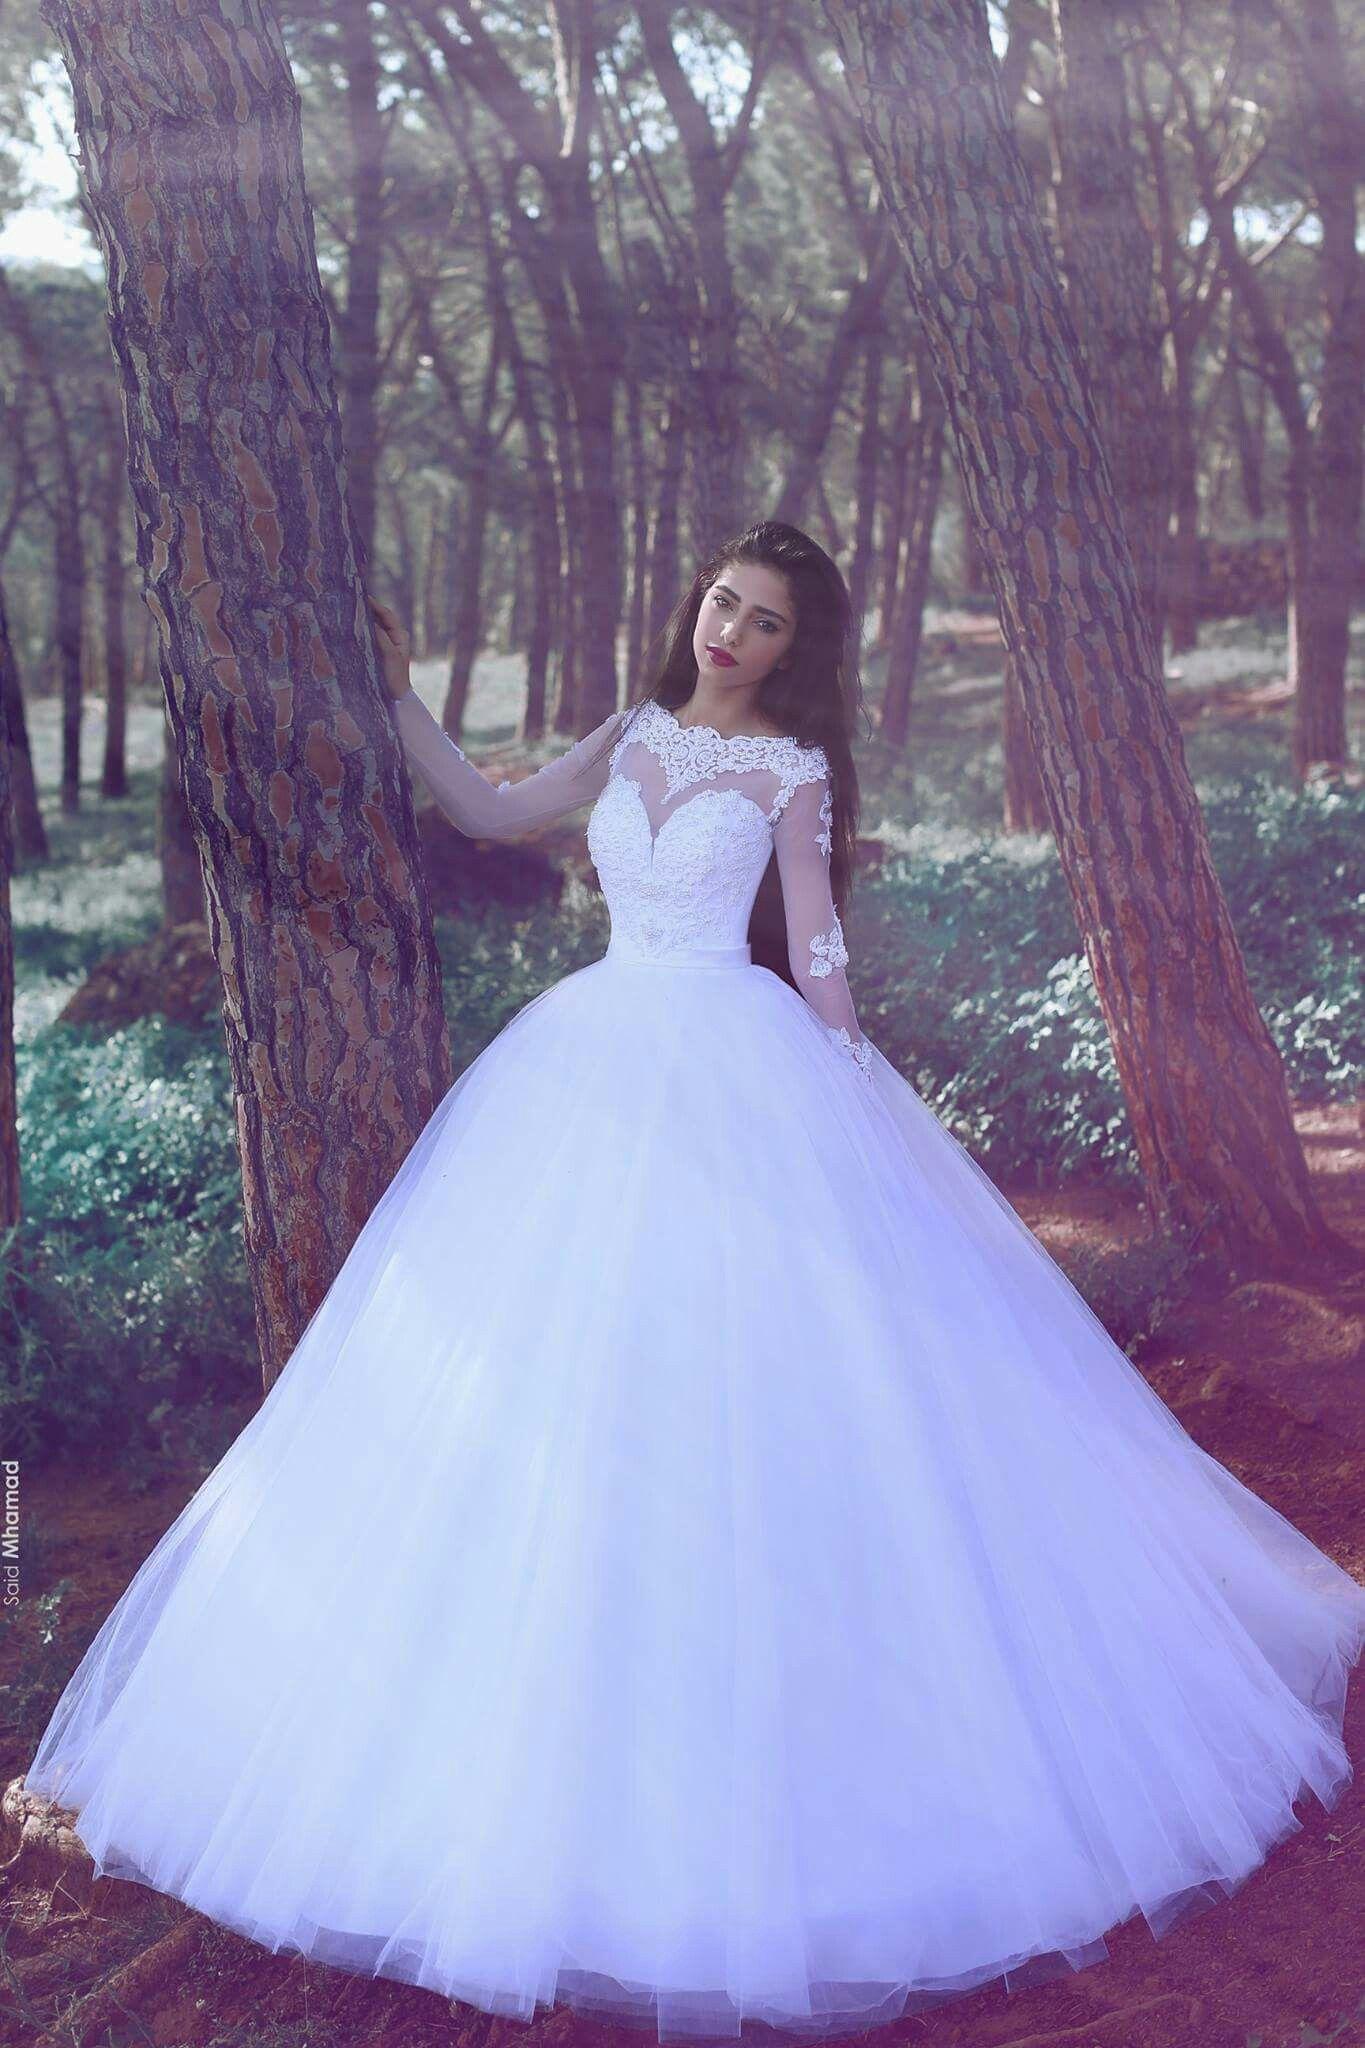 Pin de Jackie Morales en wedding and fancy dresses | Pinterest